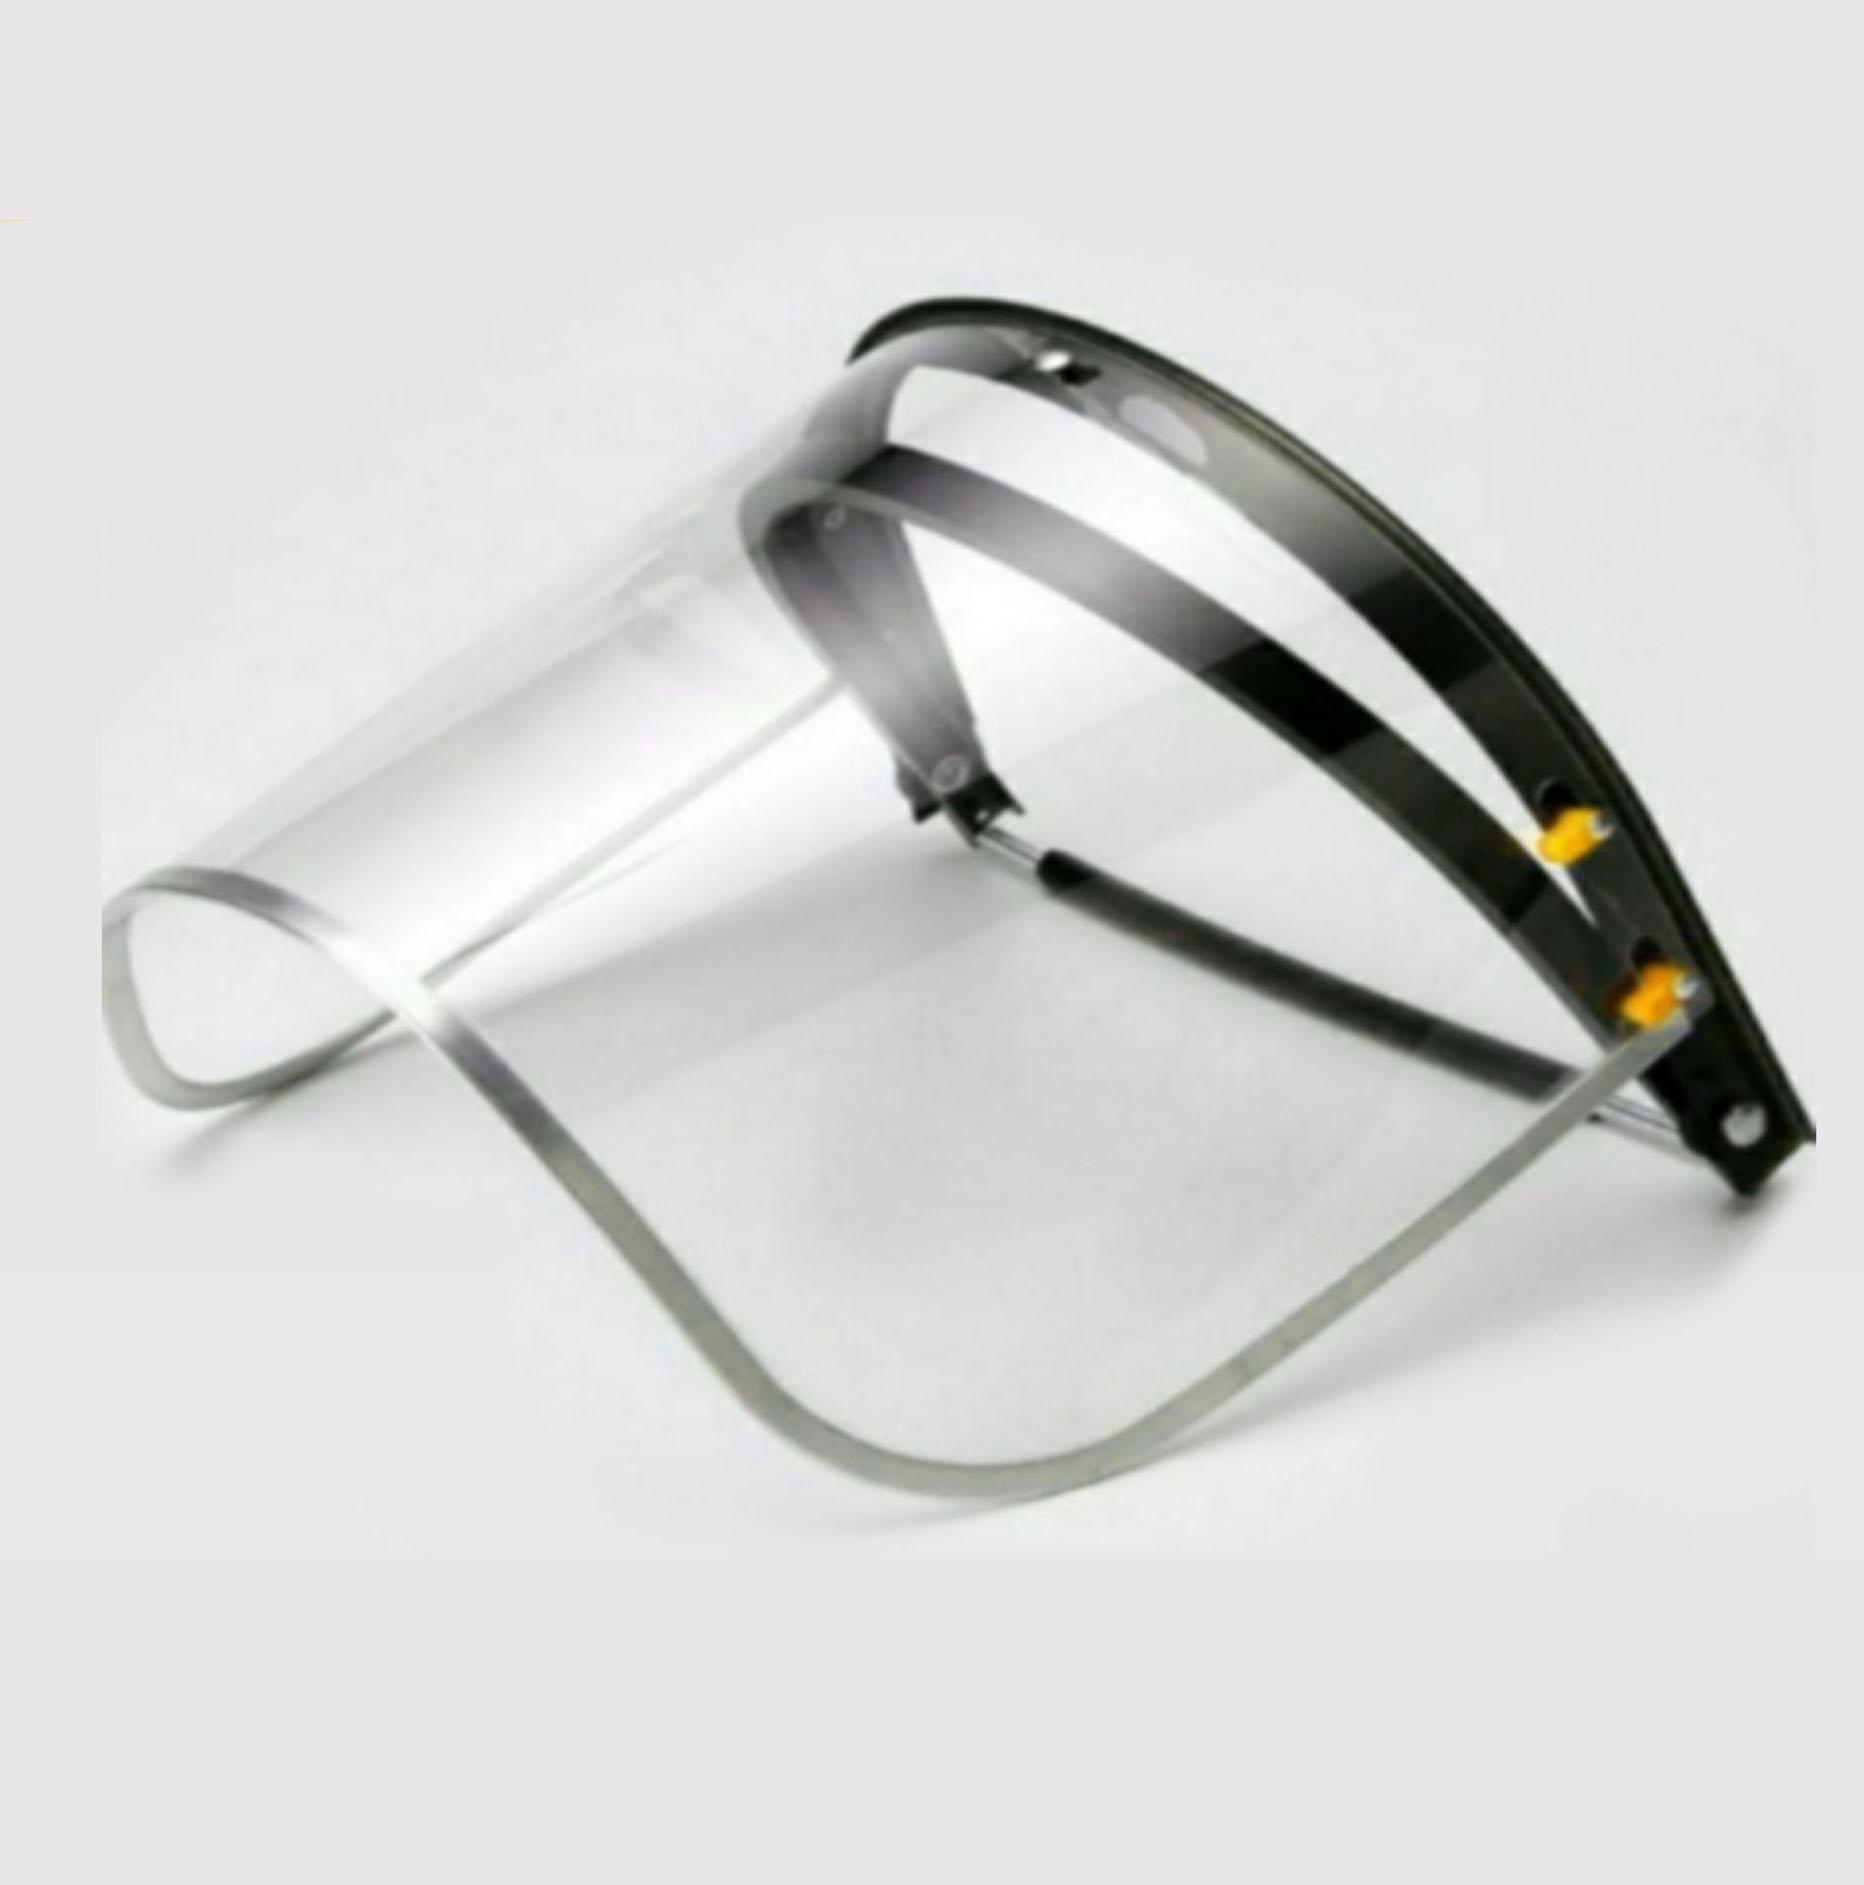 Clip Adatbale Casco Con Visor Mica